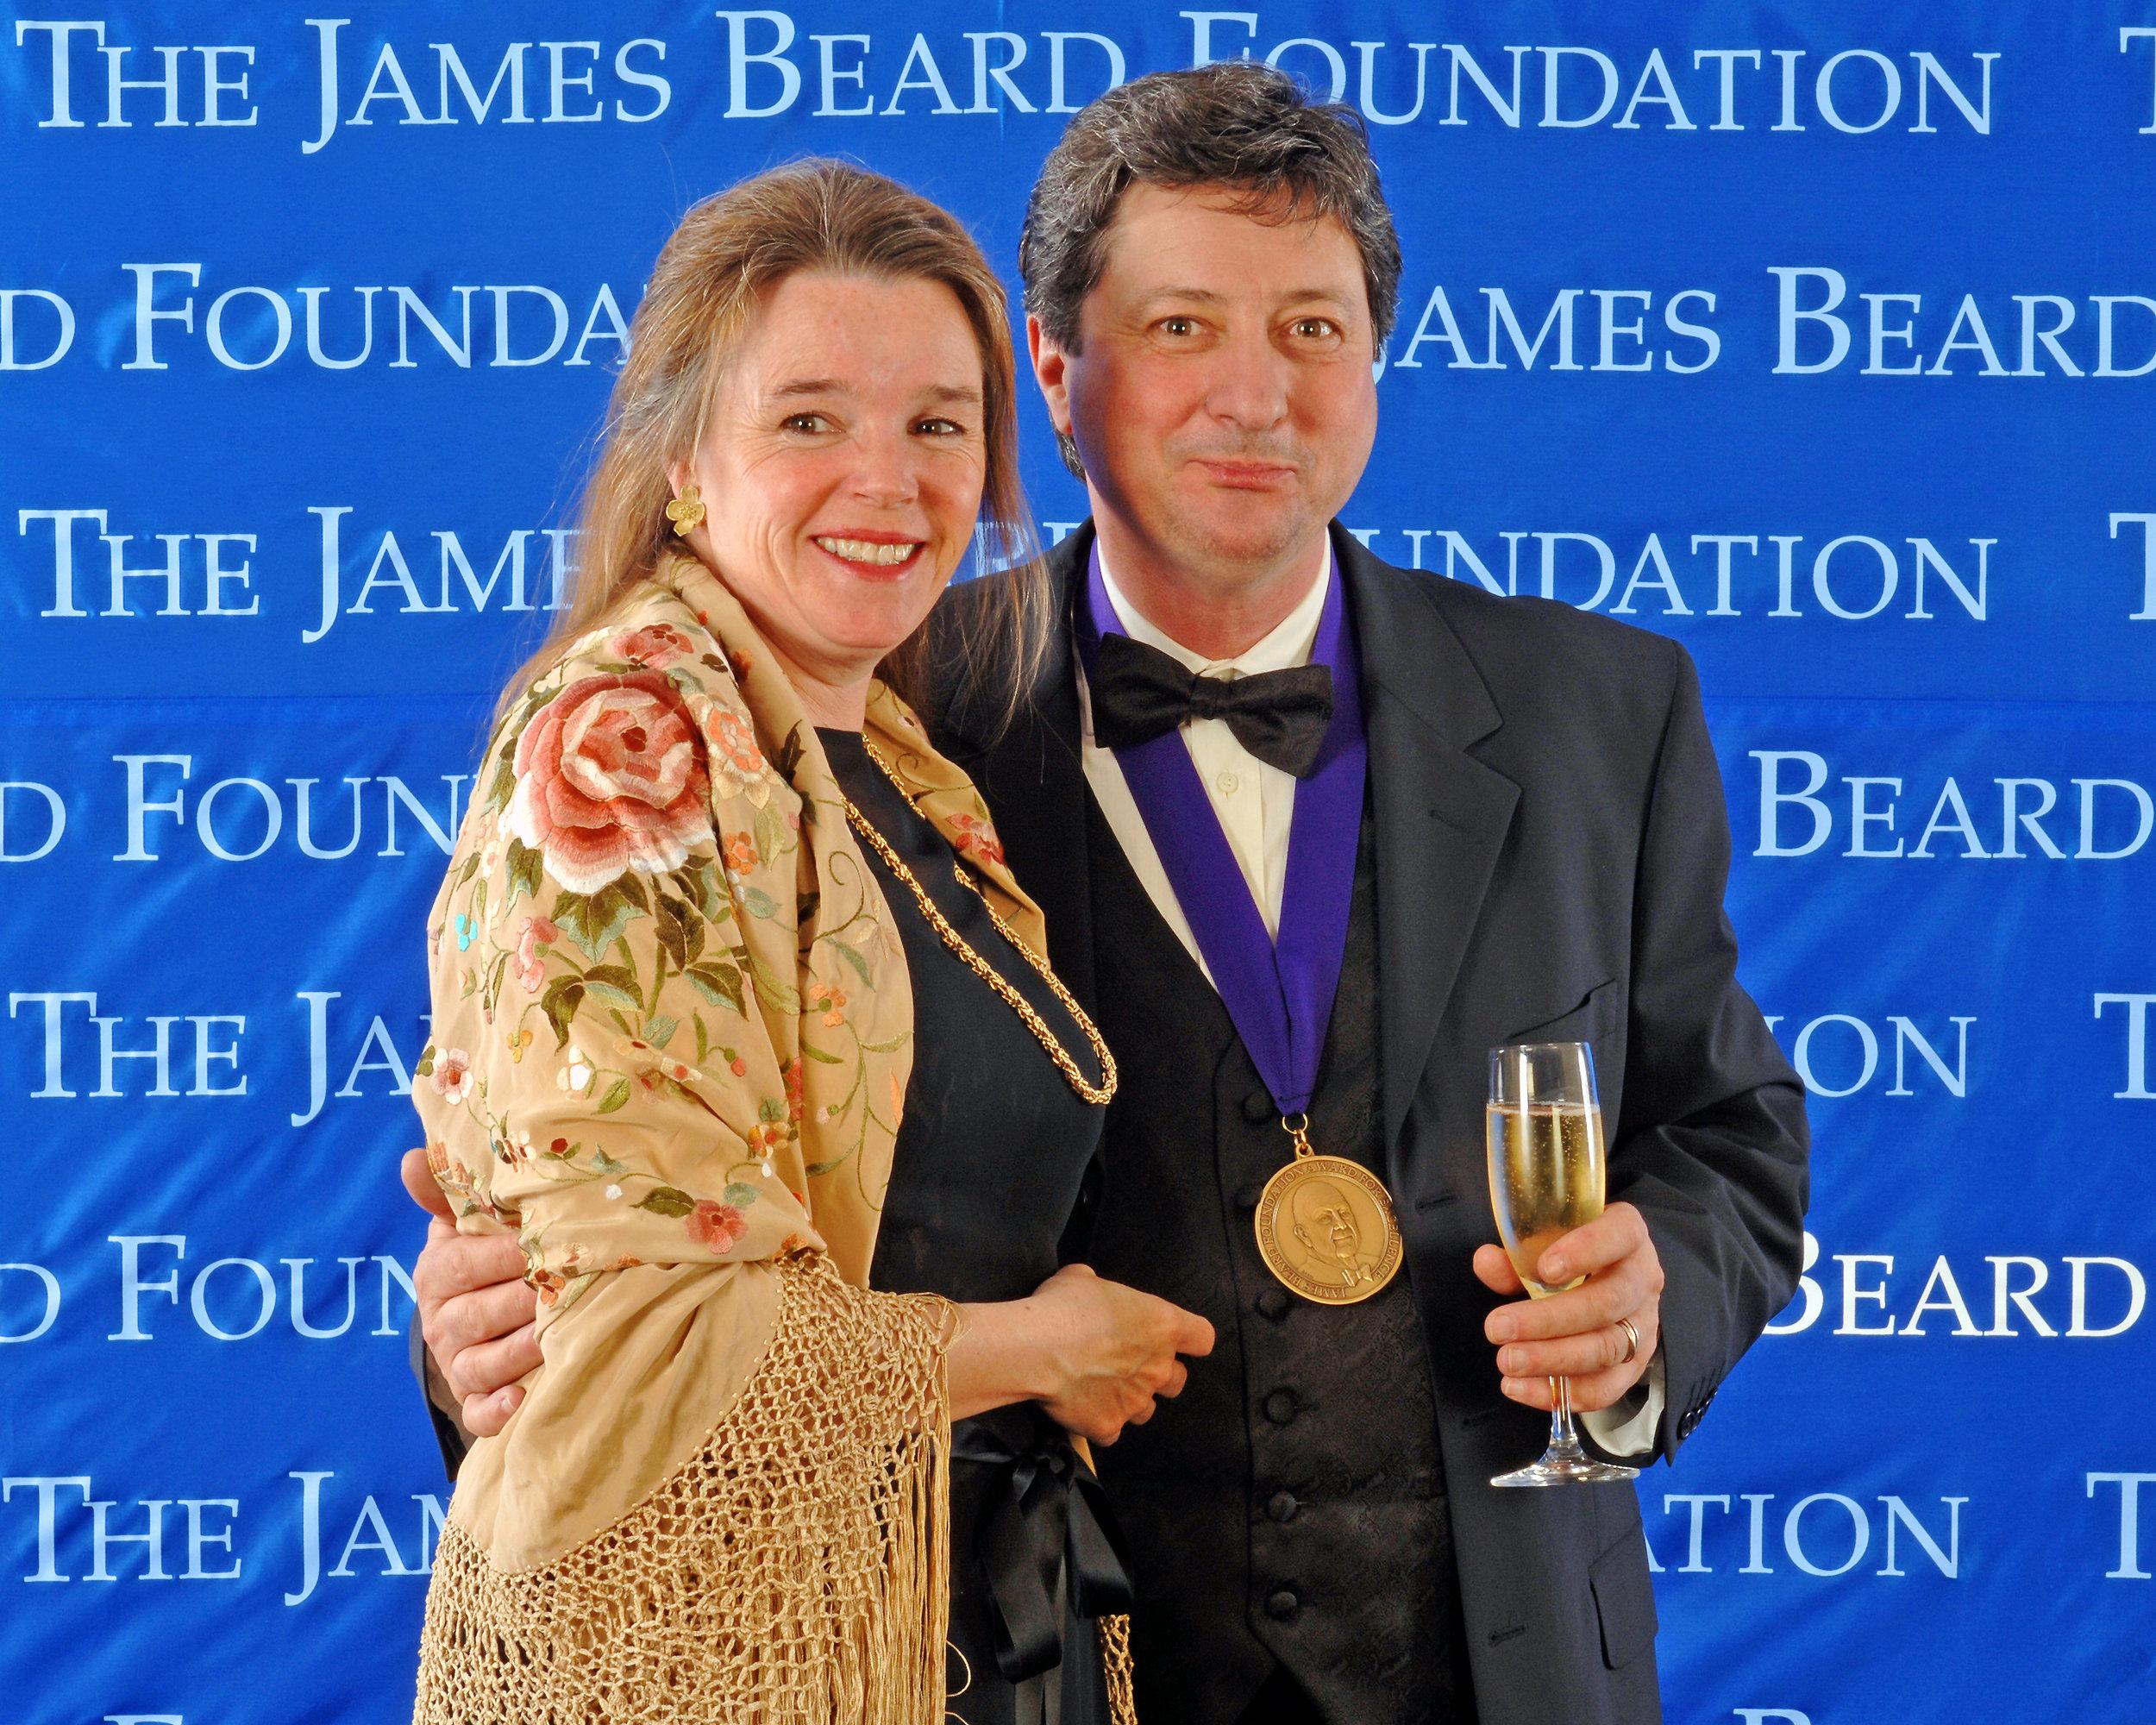 James Beard official photo one.jpg